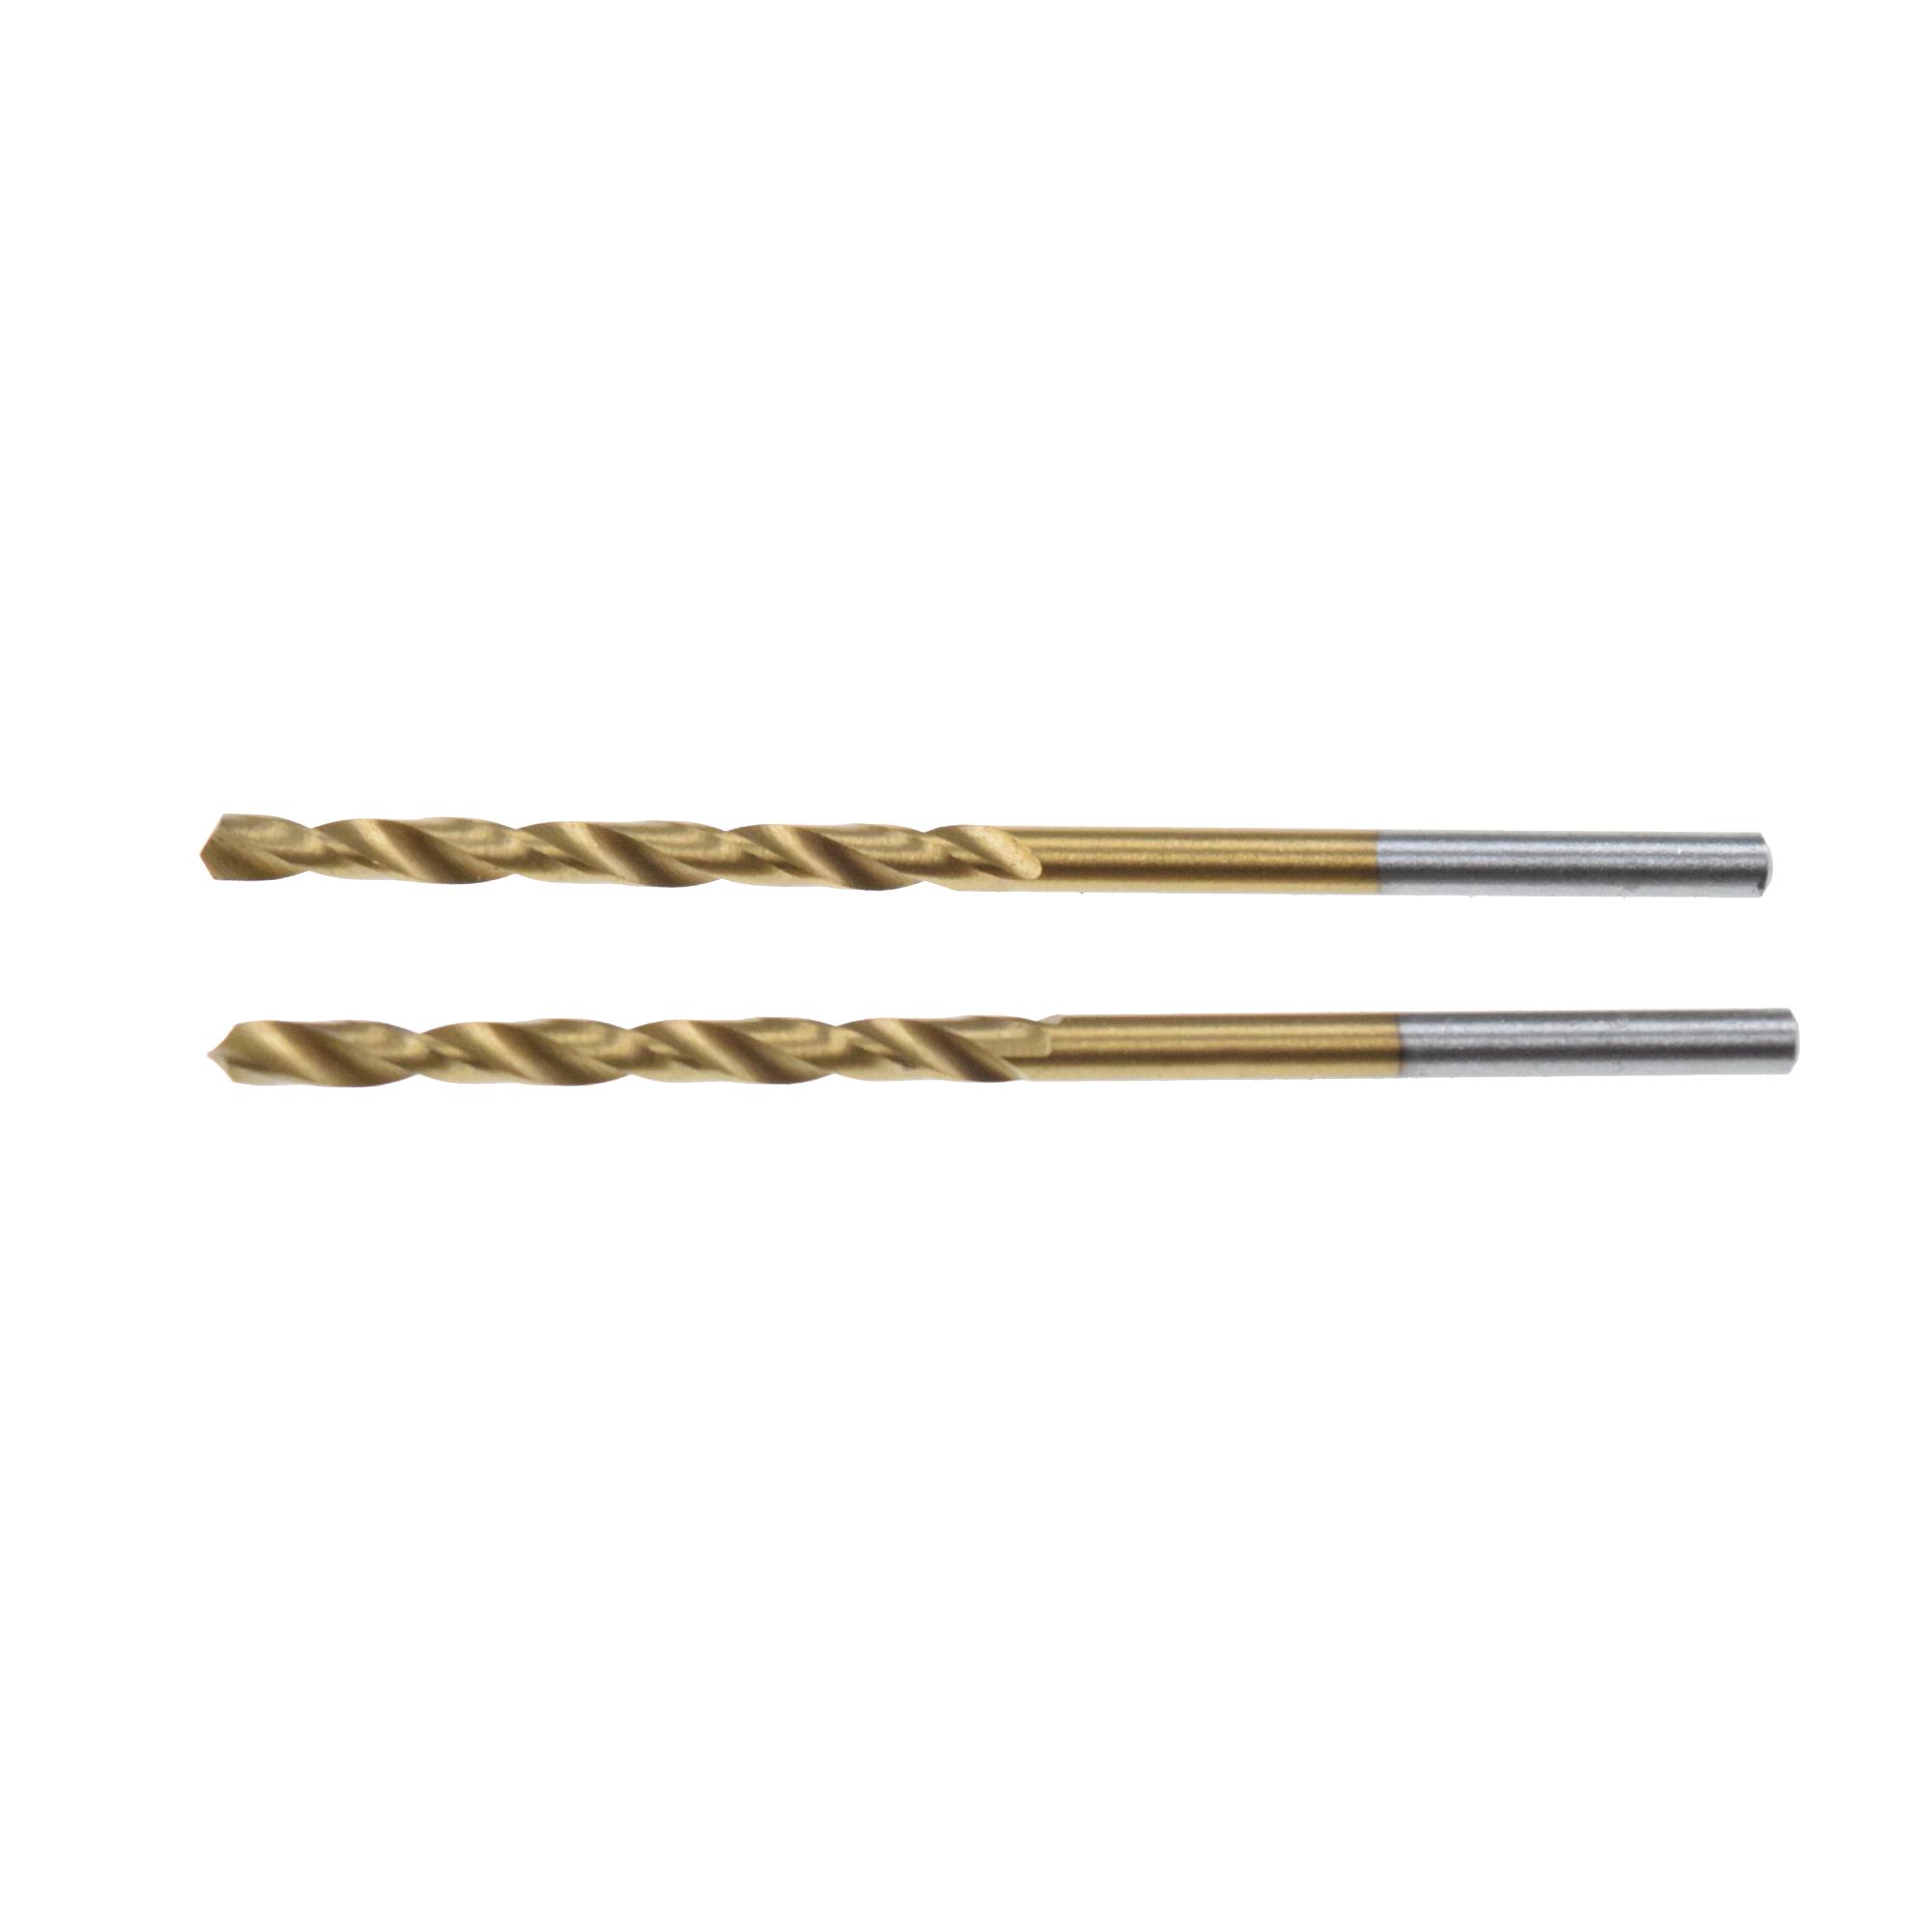 Set 2 bucati burghie pentru metal HSS Titan marca Irwin de 1.5 x 18 x 40 mm